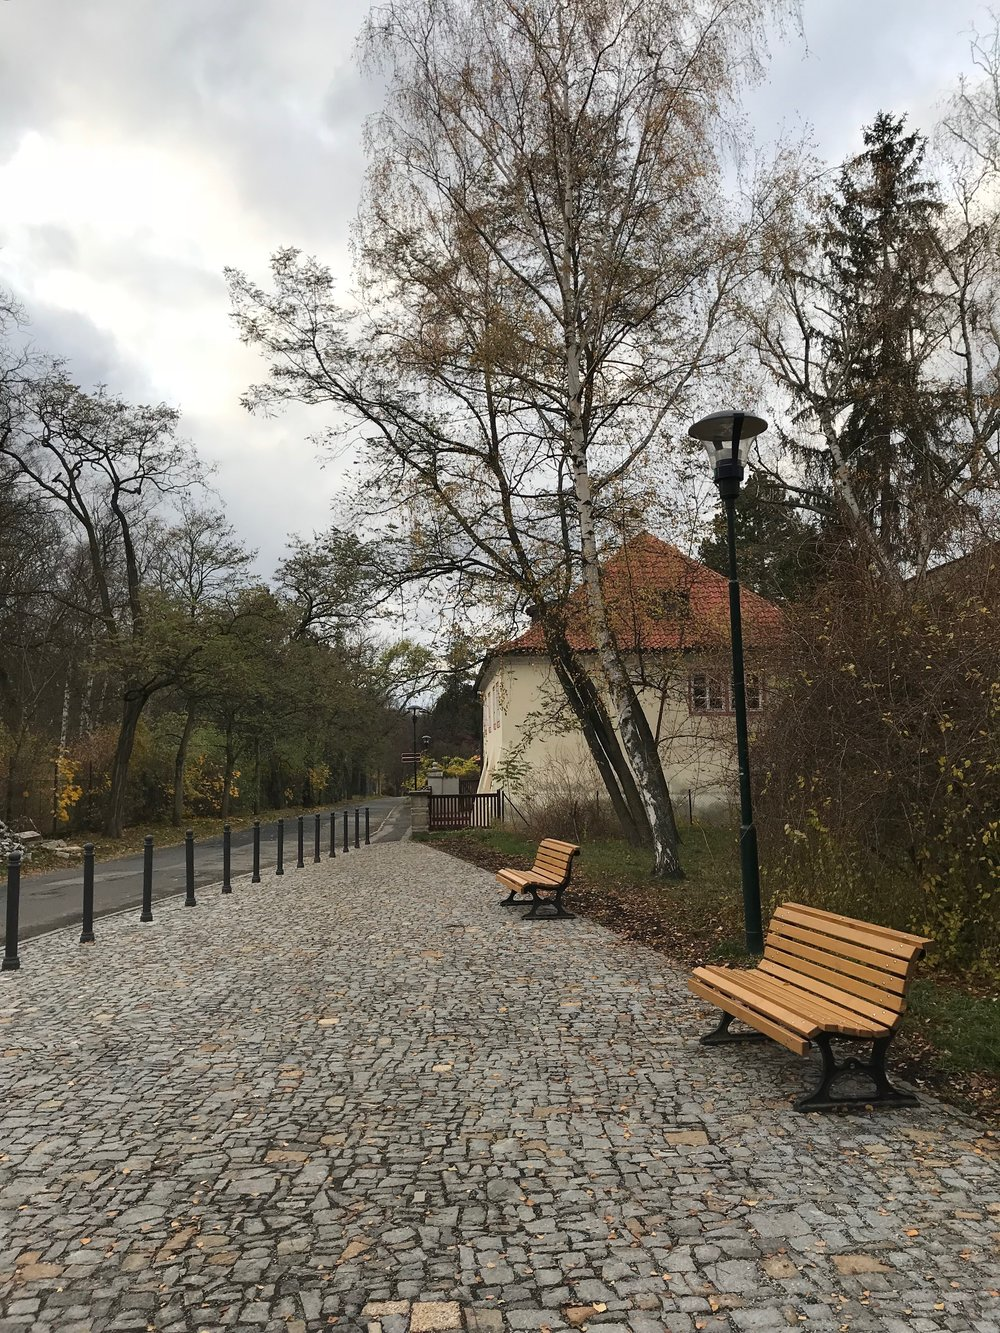 Autumn in Prague... Breathtaking!